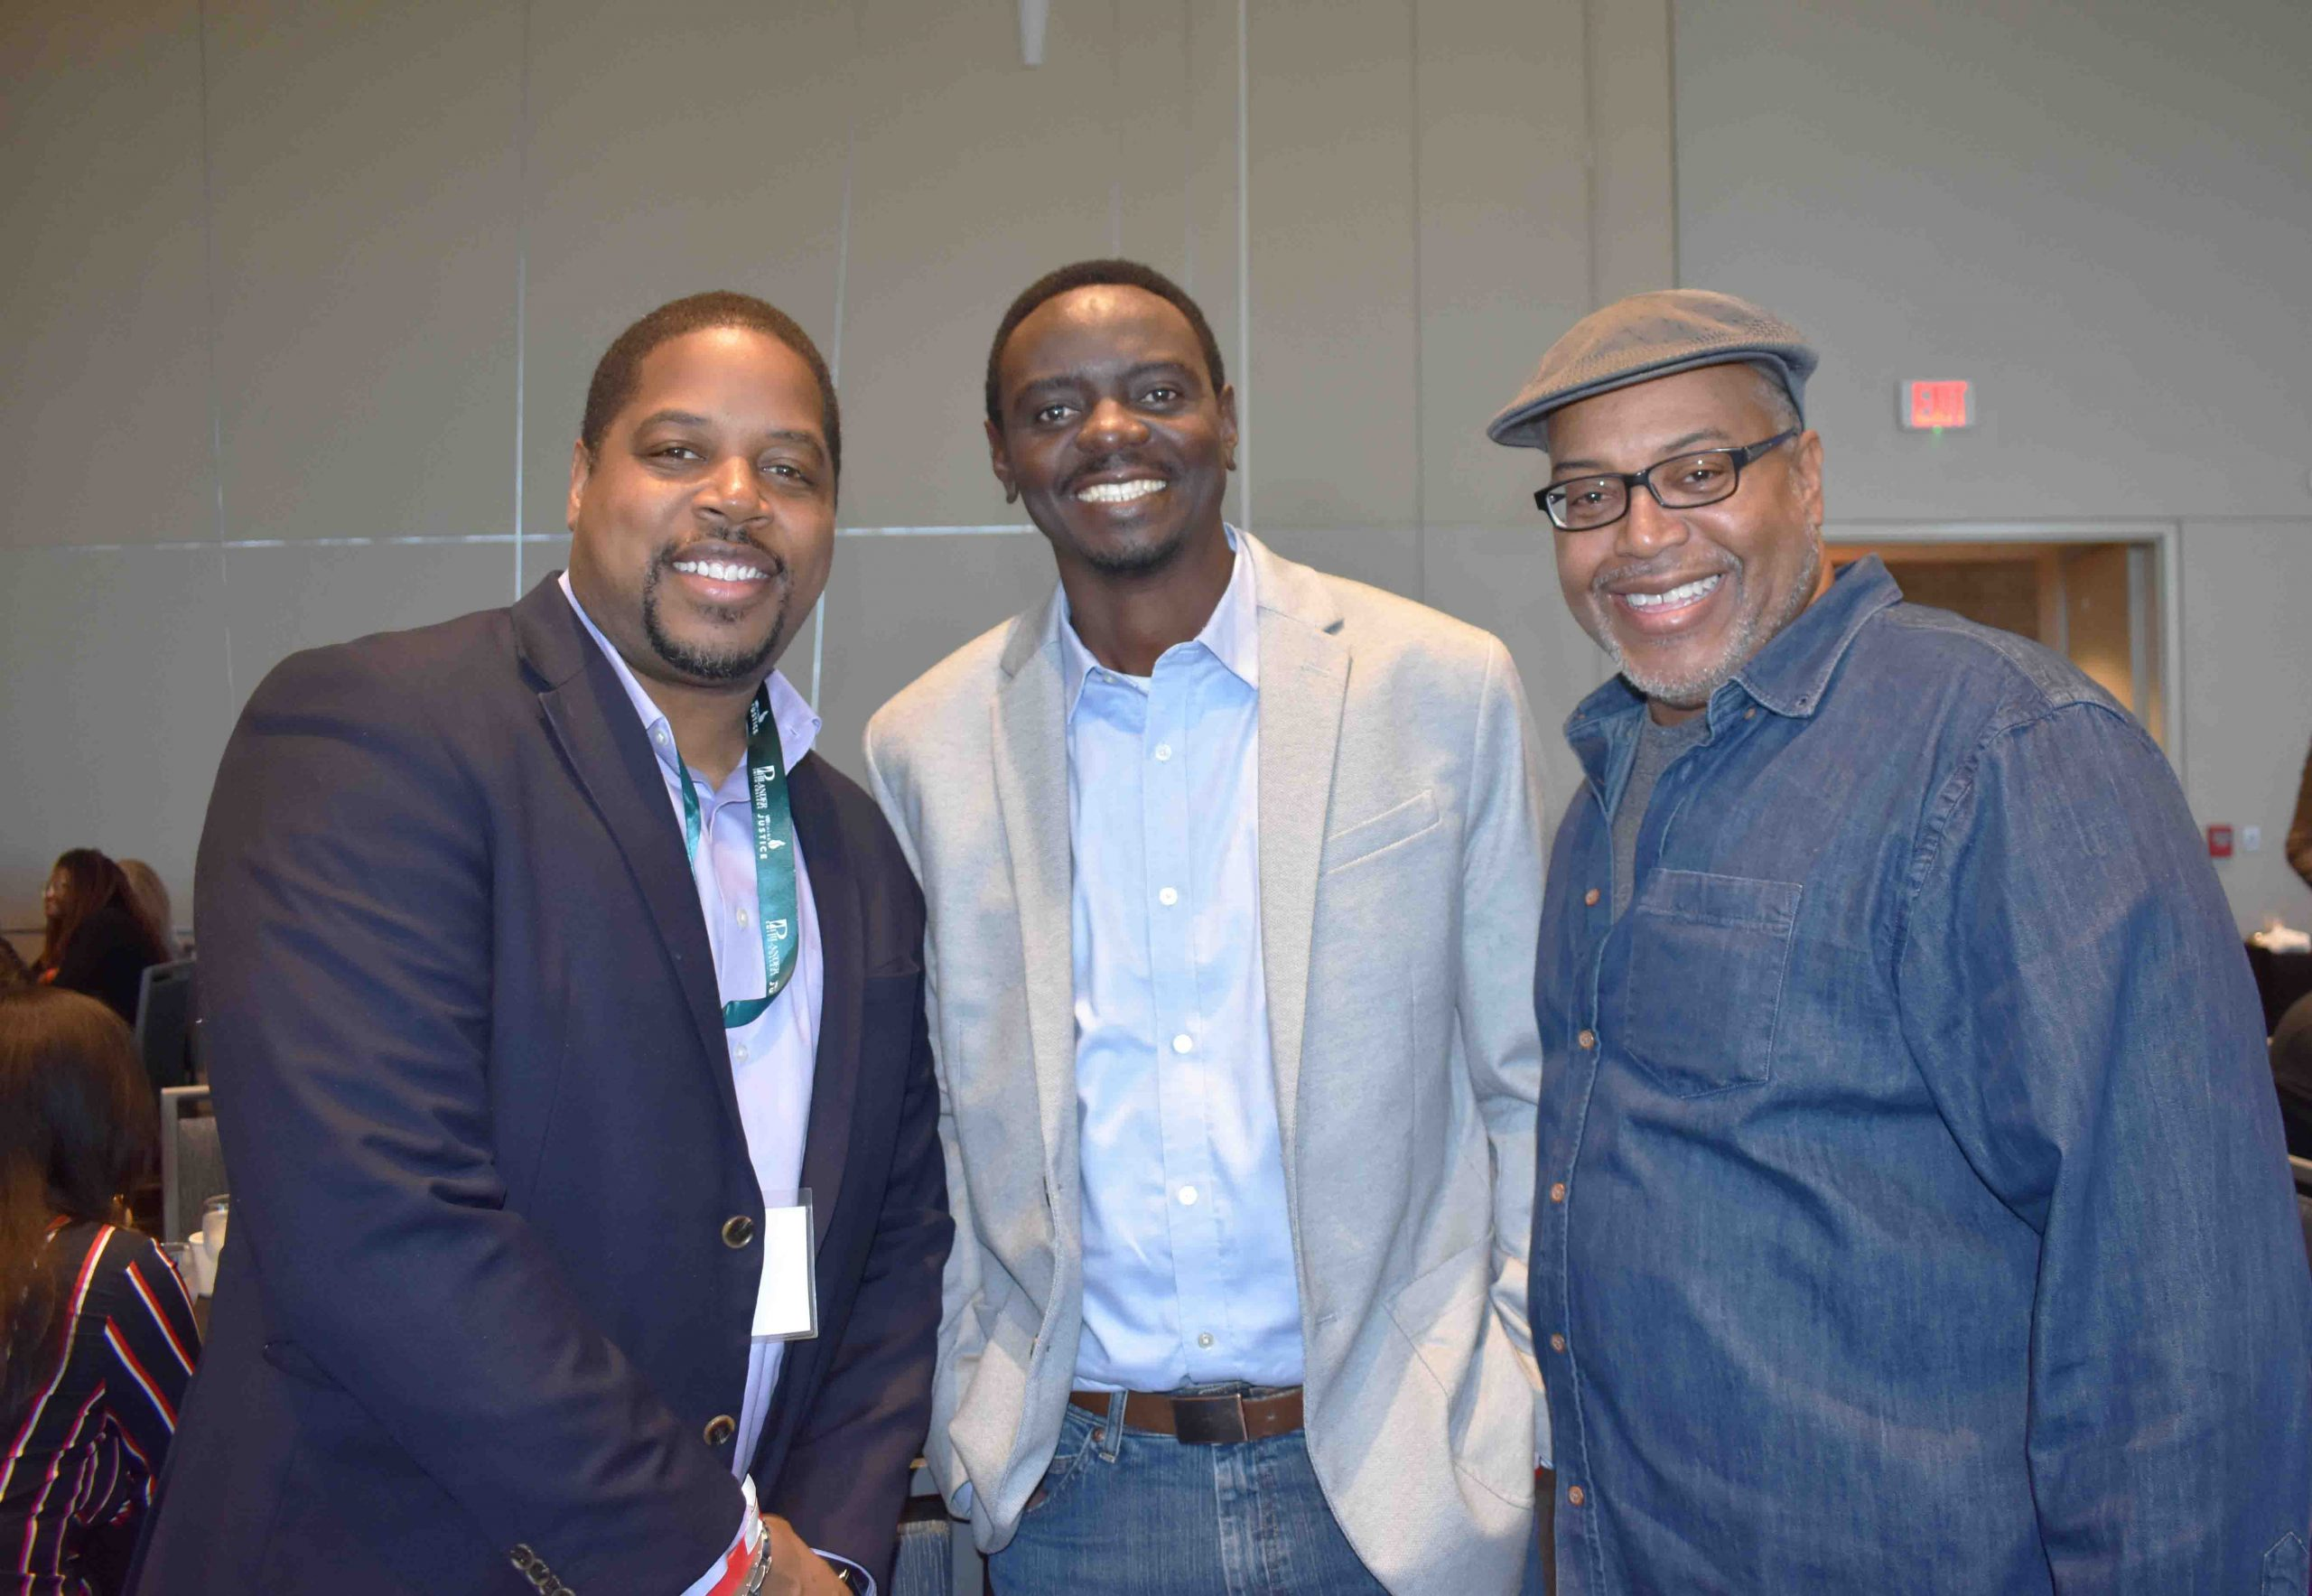 Dr. Chris Jones, Benito Lubazibwa, John Buckman, Jr Inside Pine Bluff School District 2021 2020 Holiday Schedule